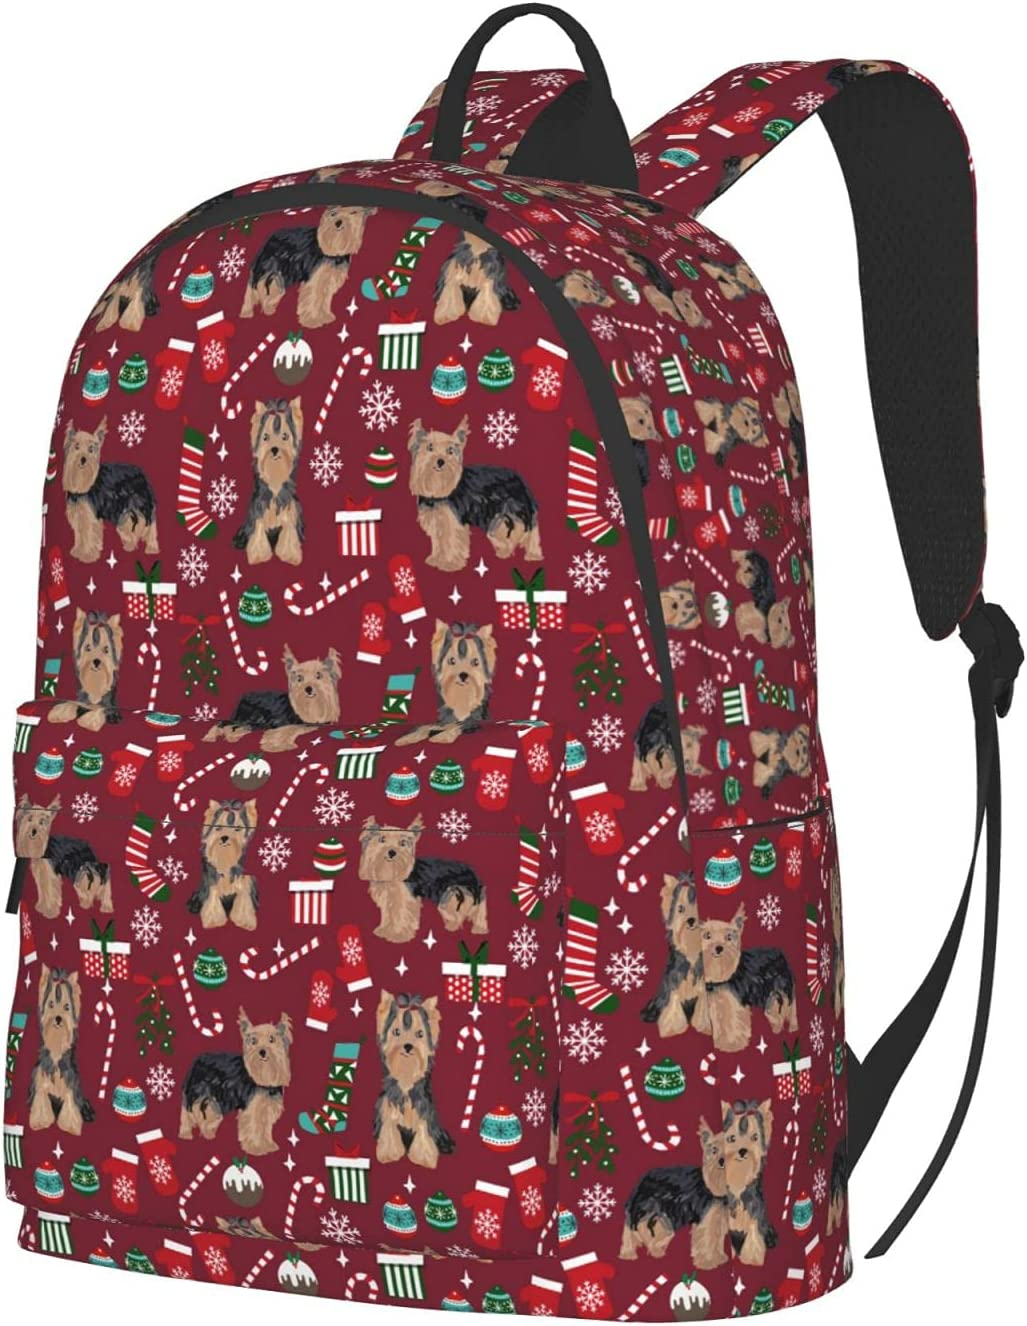 Award Yorkshire Dog Red Xmas Christmas Large Backpack New life Capacity School